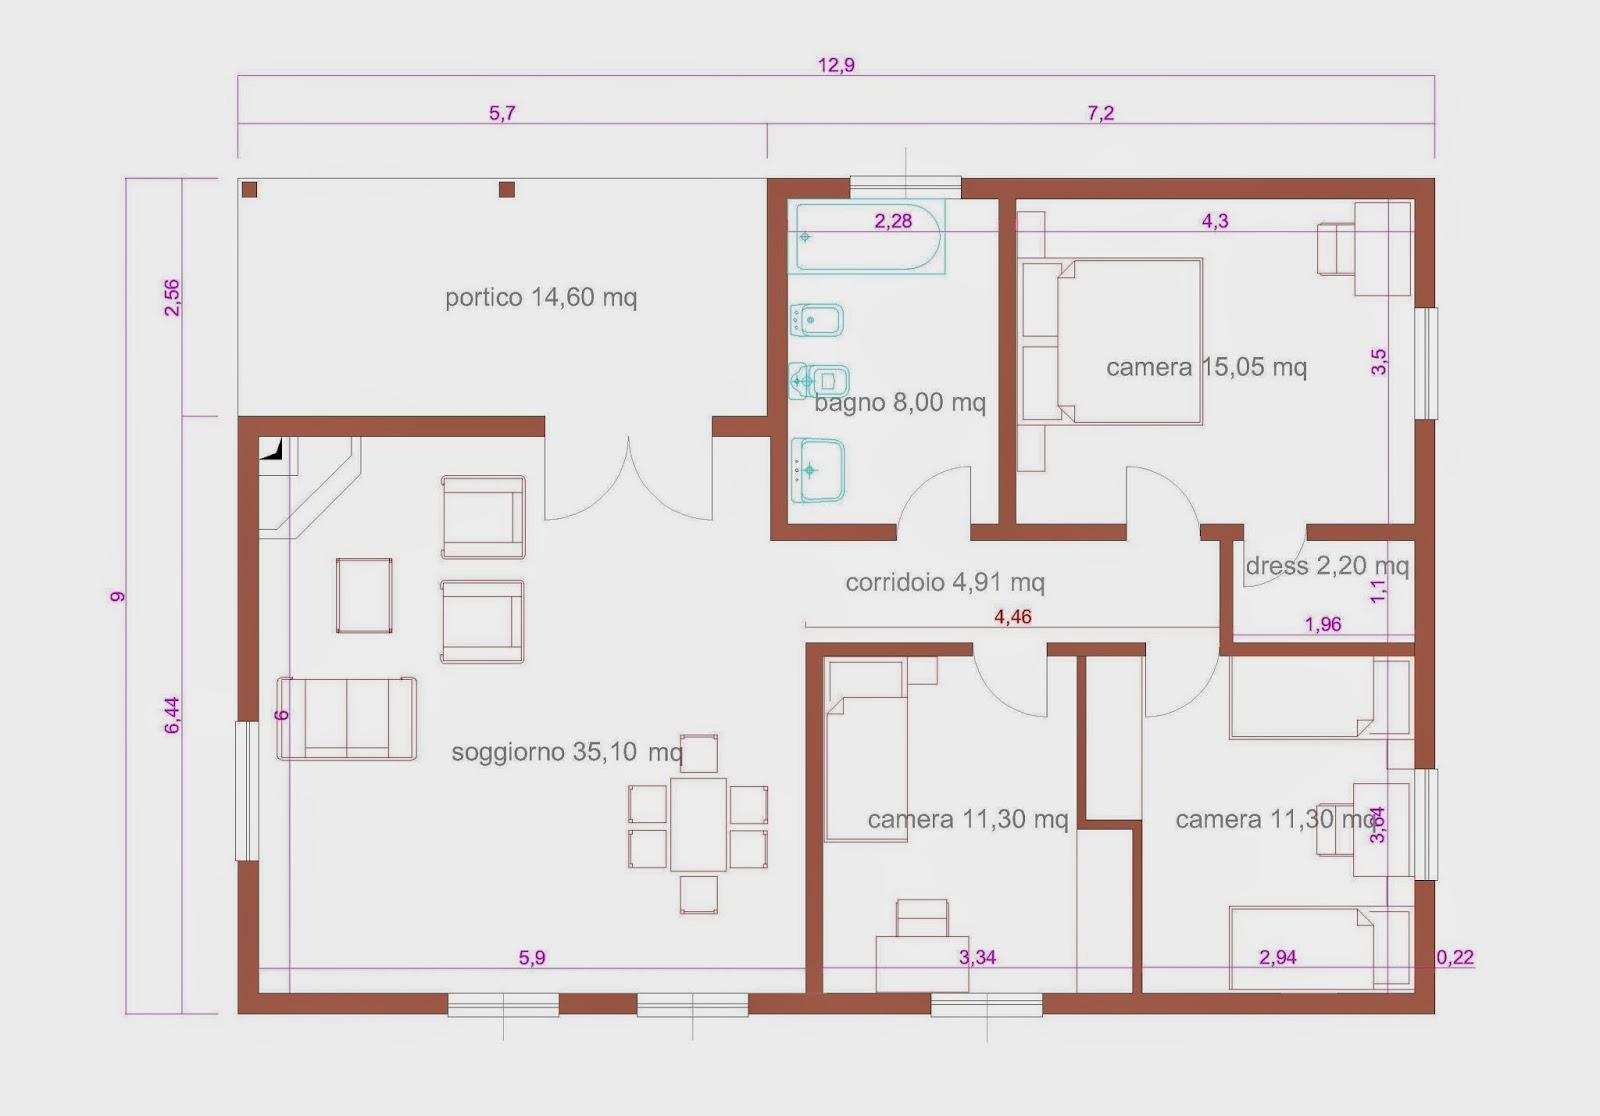 Appartamento 120 mq progetto ko61 regardsdefemmes - Planimetria casa 100 mq ...